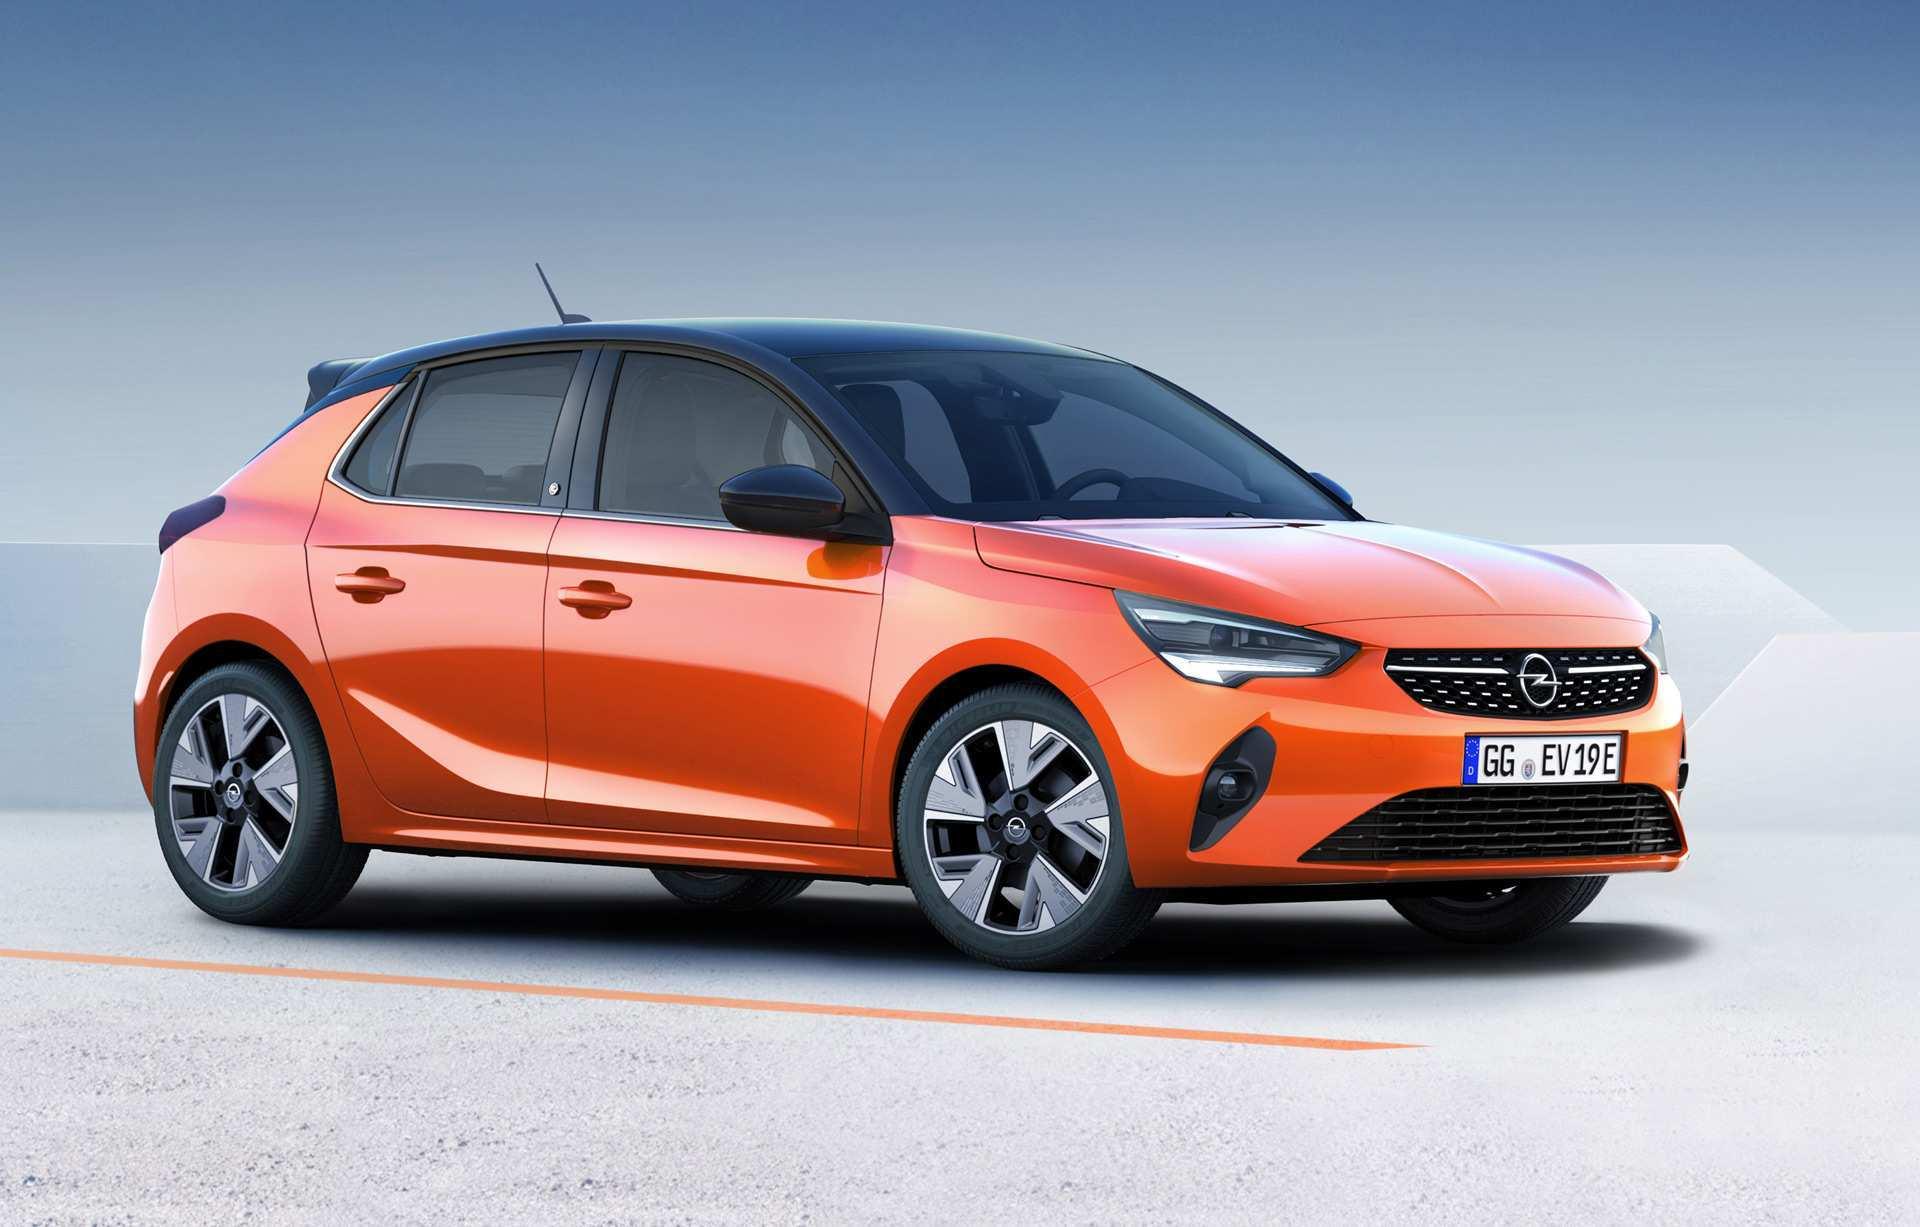 56 Best Review Opel En 2020 Redesign and Concept with Opel En 2020